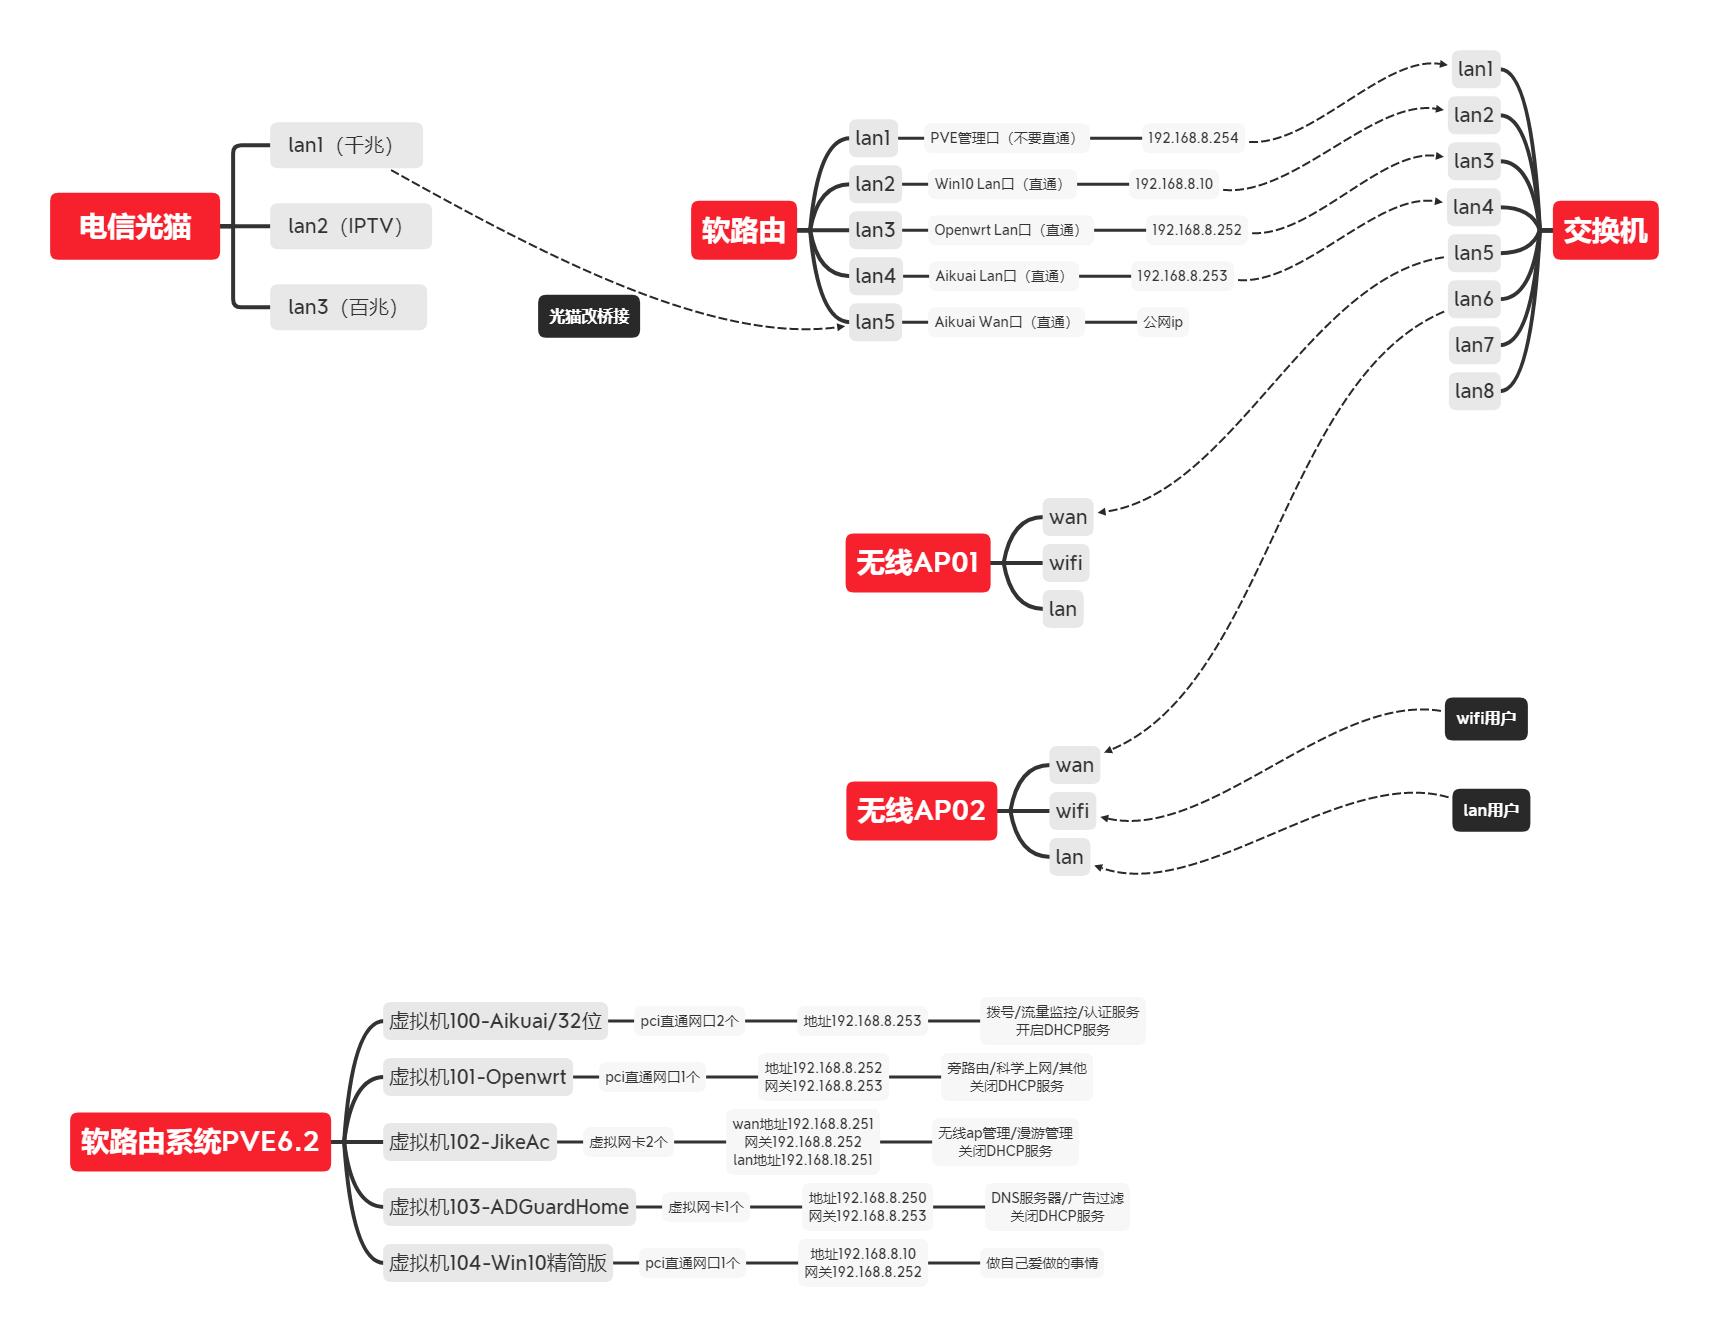 Proxmox VE PVE虚拟机 直通互通设置 openwrt软路由 旁路由 adgaurdhome 集客ac ap拓扑图